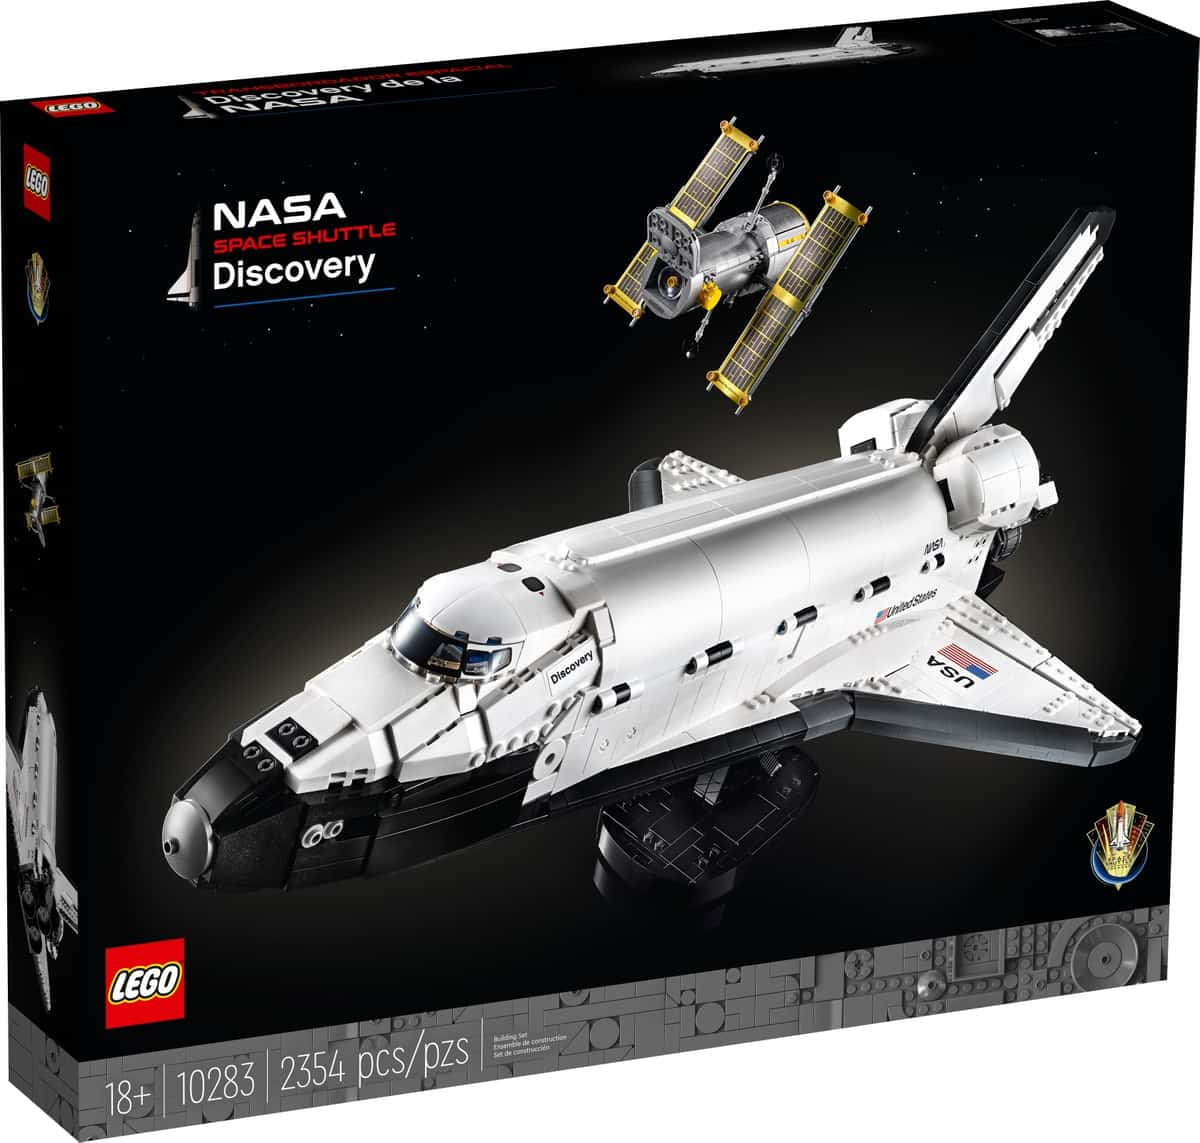 lego 10283 transbordador espacial discovery de la nasa